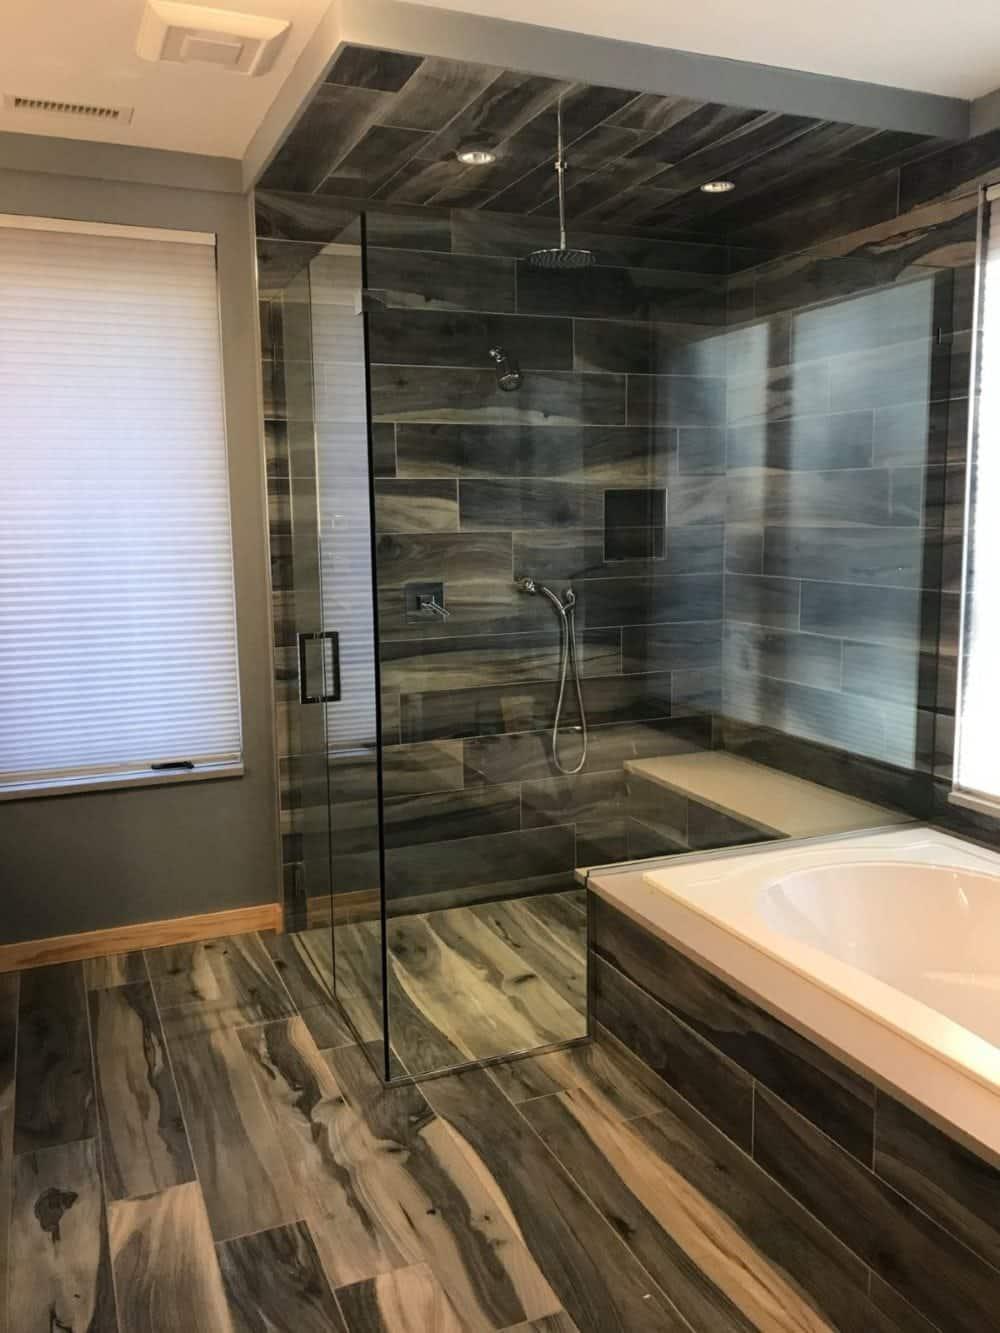 Absolute Shower Doors. The Best in Custom Glass Shower Doors Since 1995